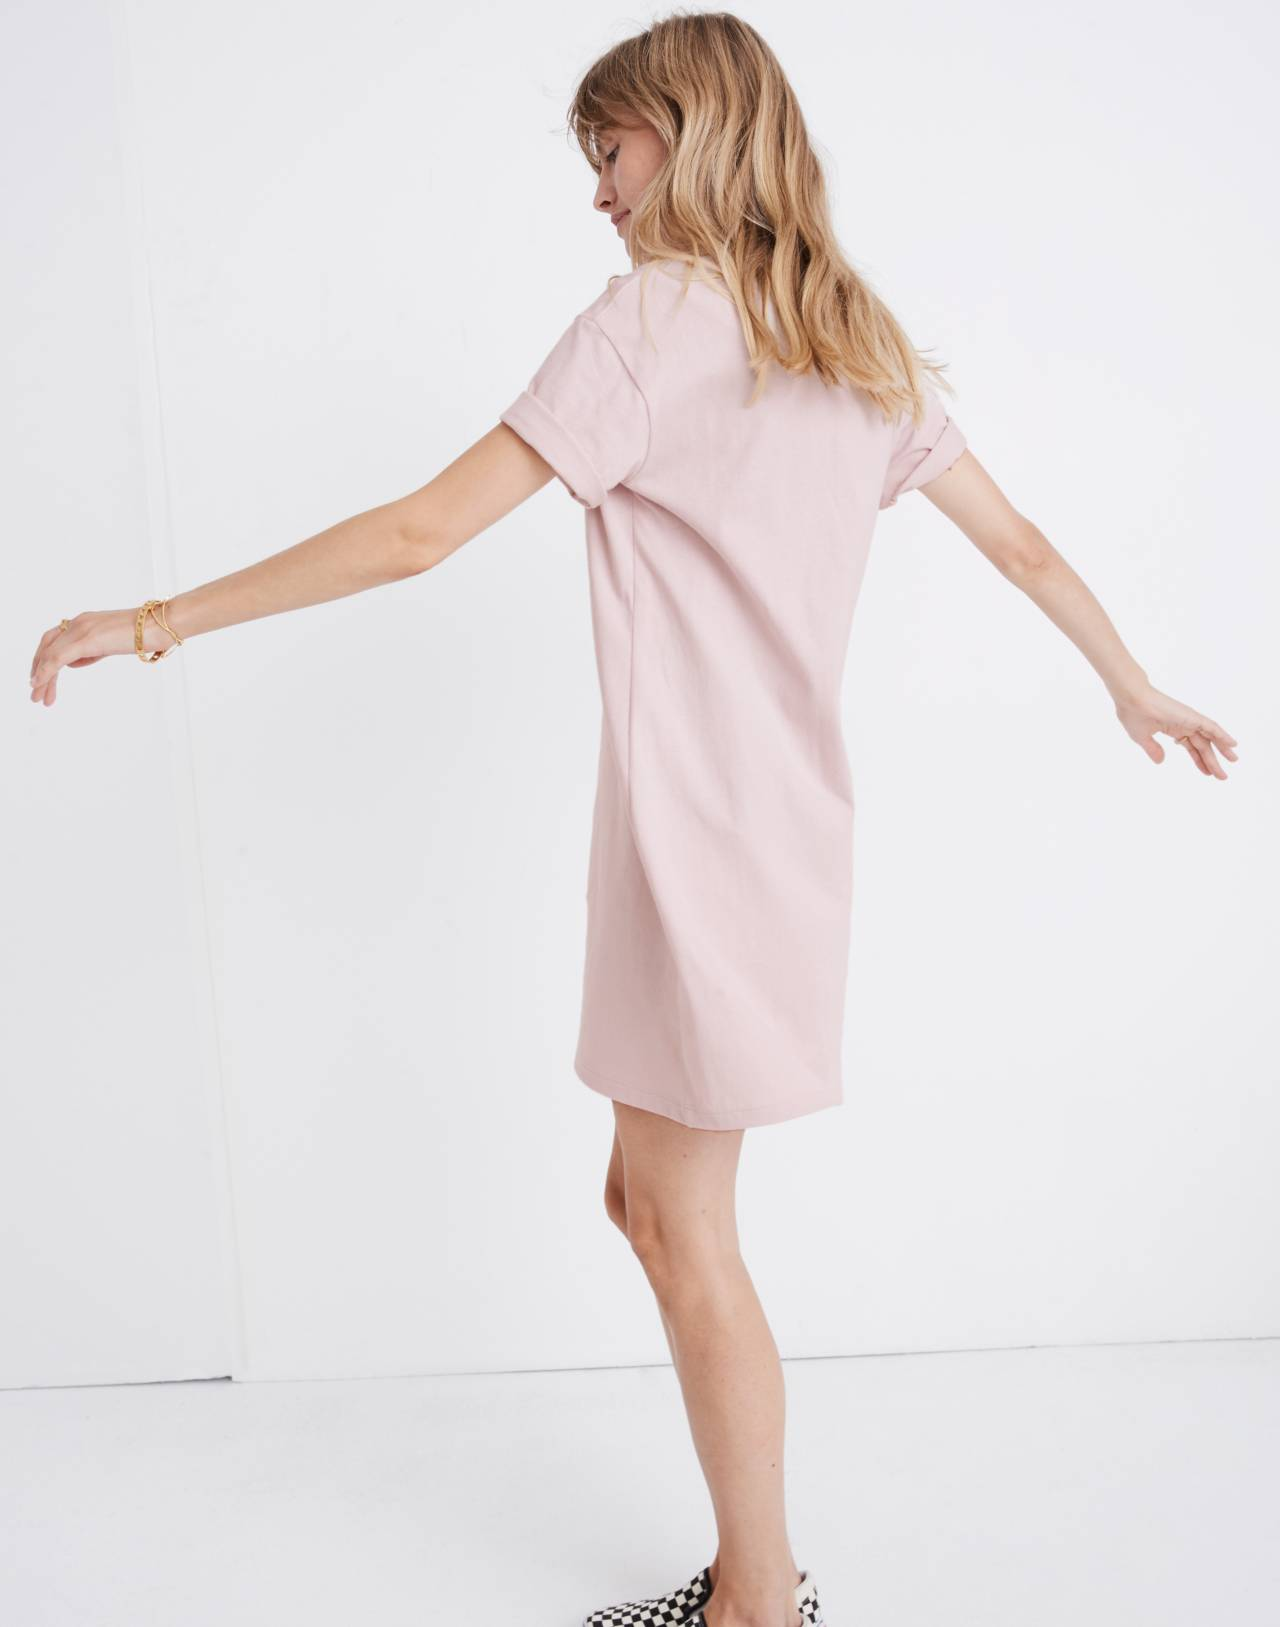 Pocket Tee Dress in wisteria dove image 2